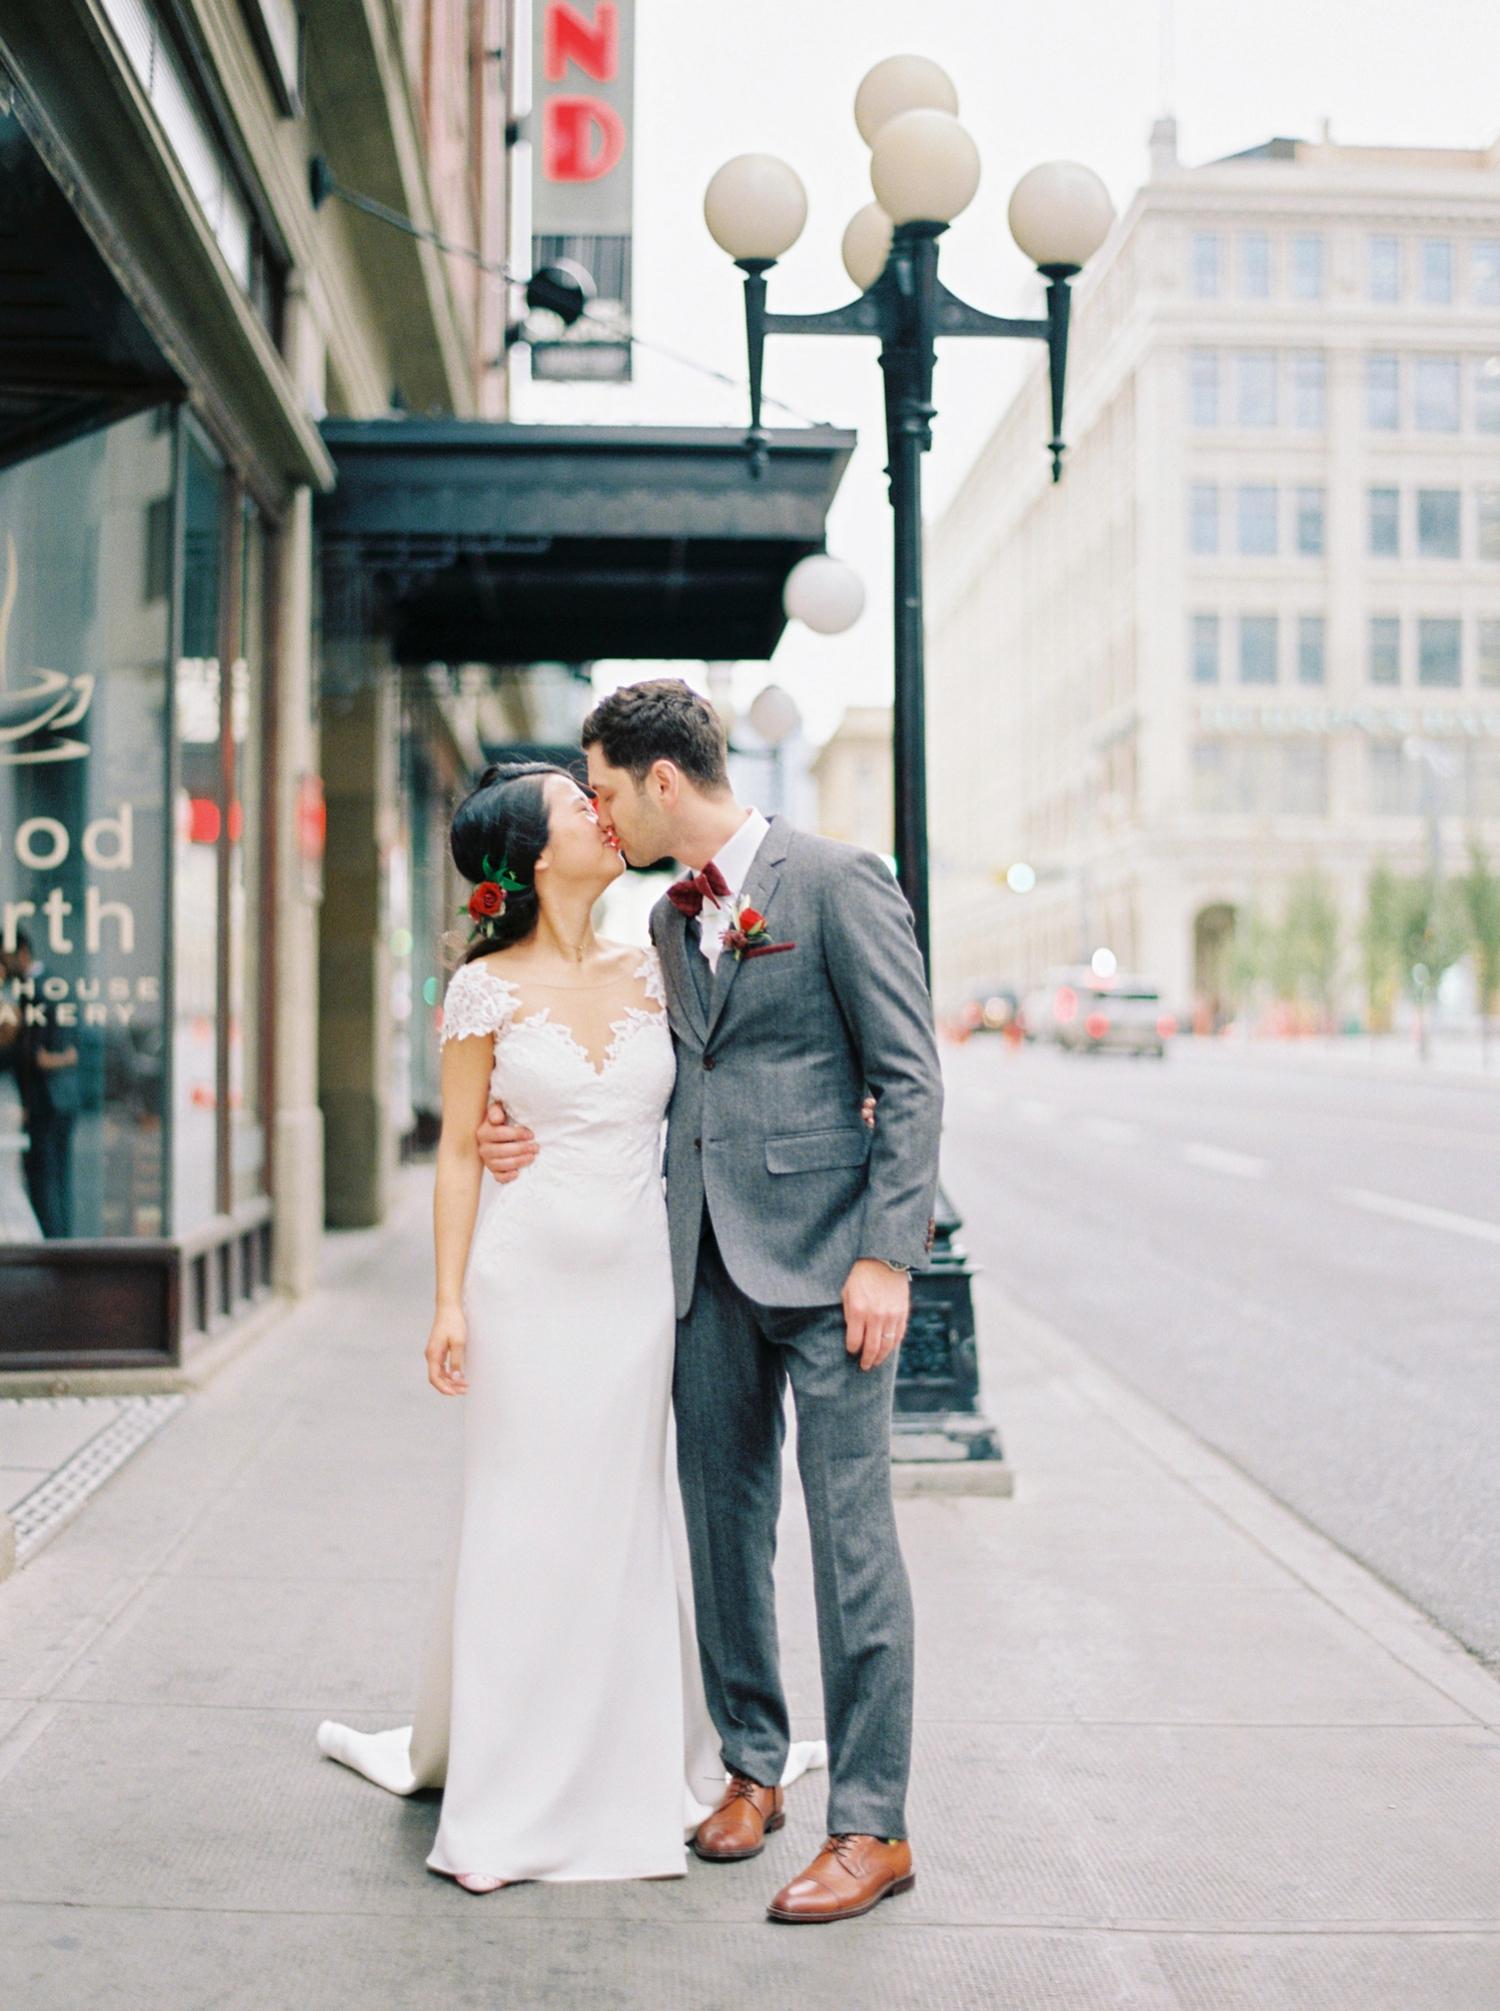 Calgary wedding photographer | fine art film photography | Calgary Wedding Photographers | Calgary couples photographer | Justine Milton Photography | downtown calgary | couples portrait